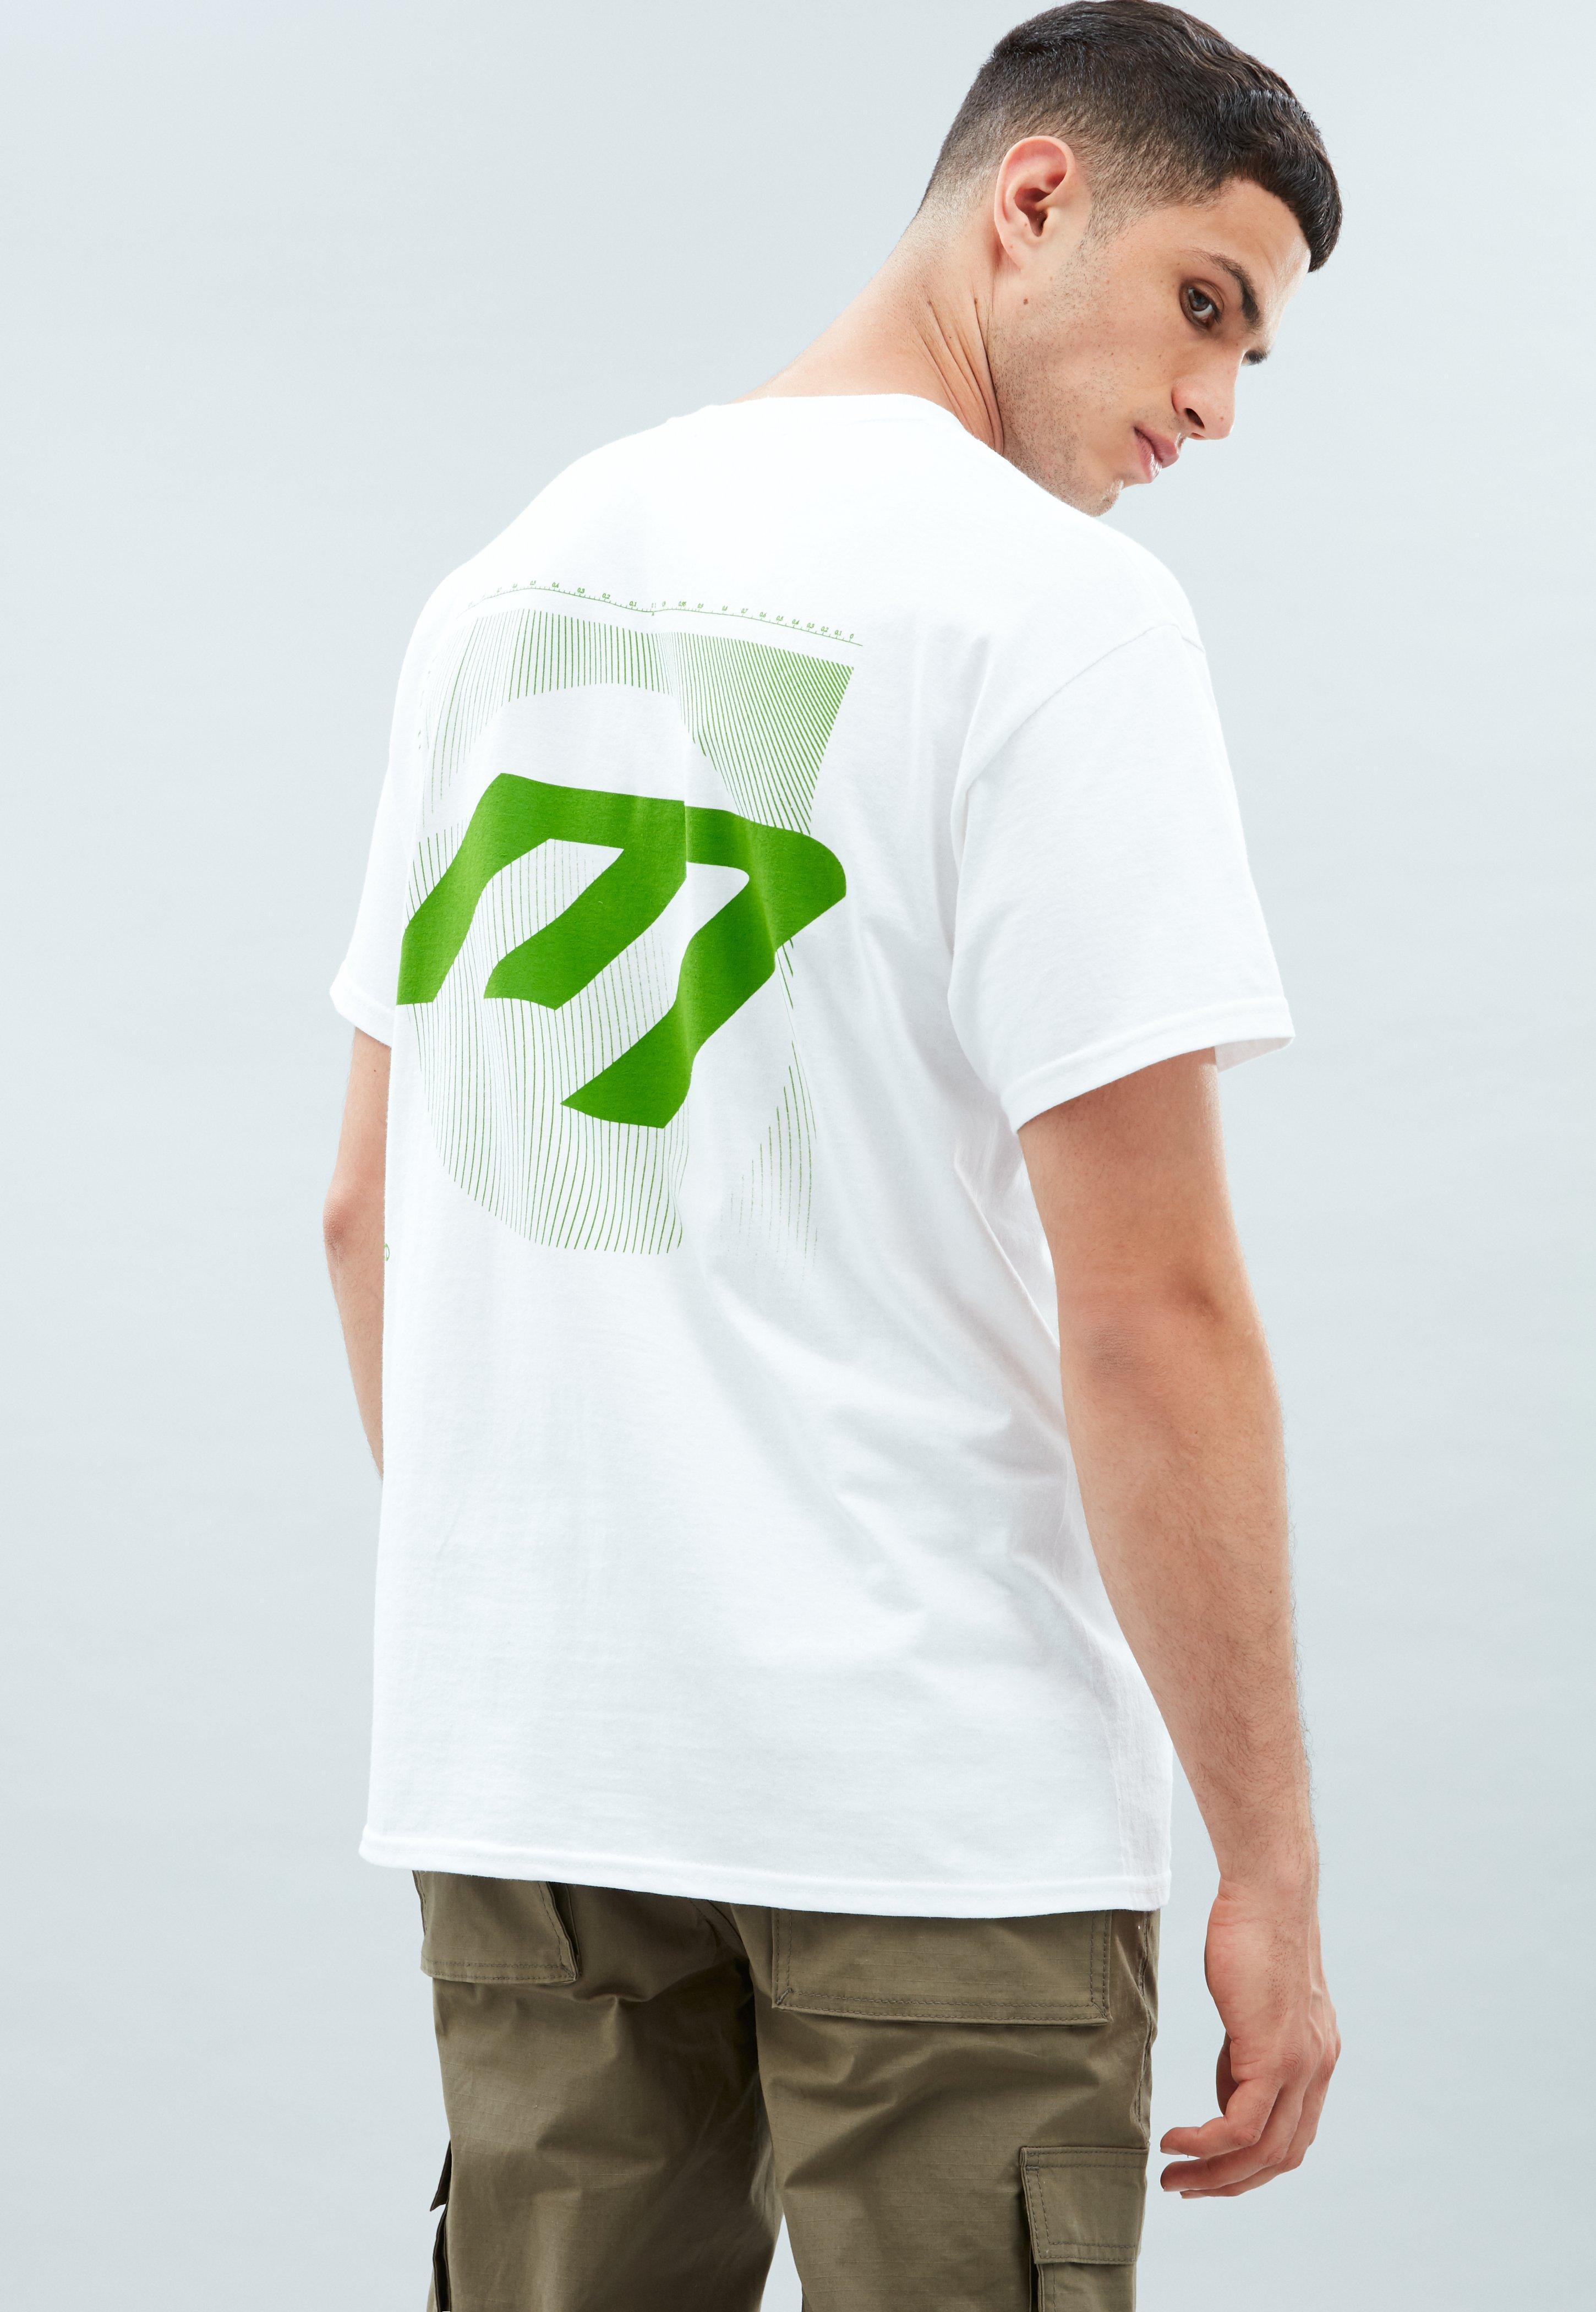 d6f0eacd2737 Men s T-Shirts